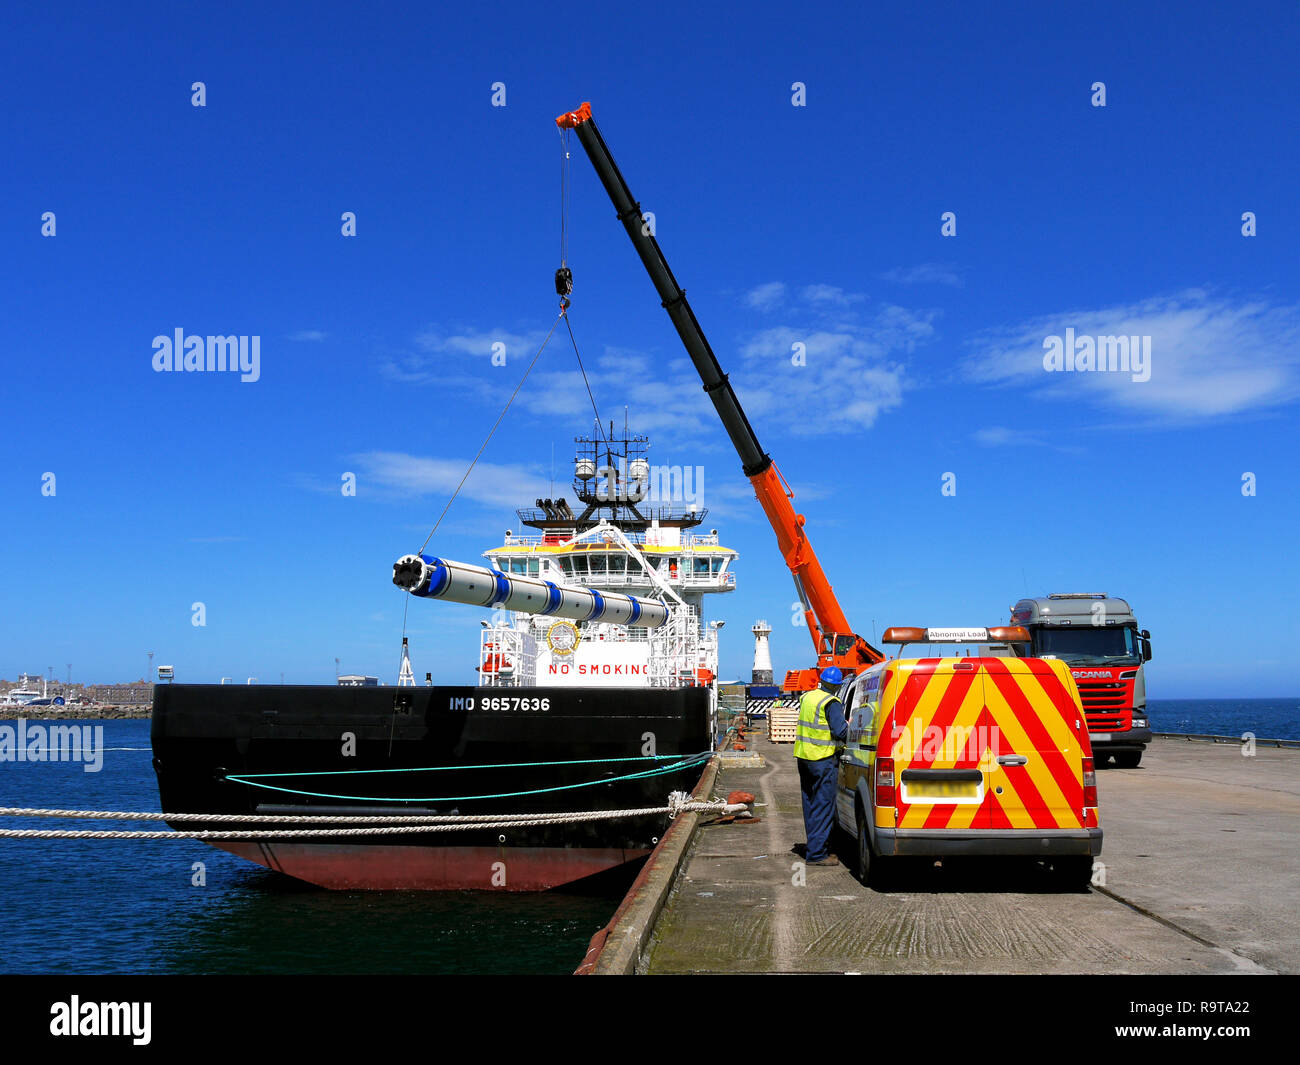 Cargo Handling - Stock Image